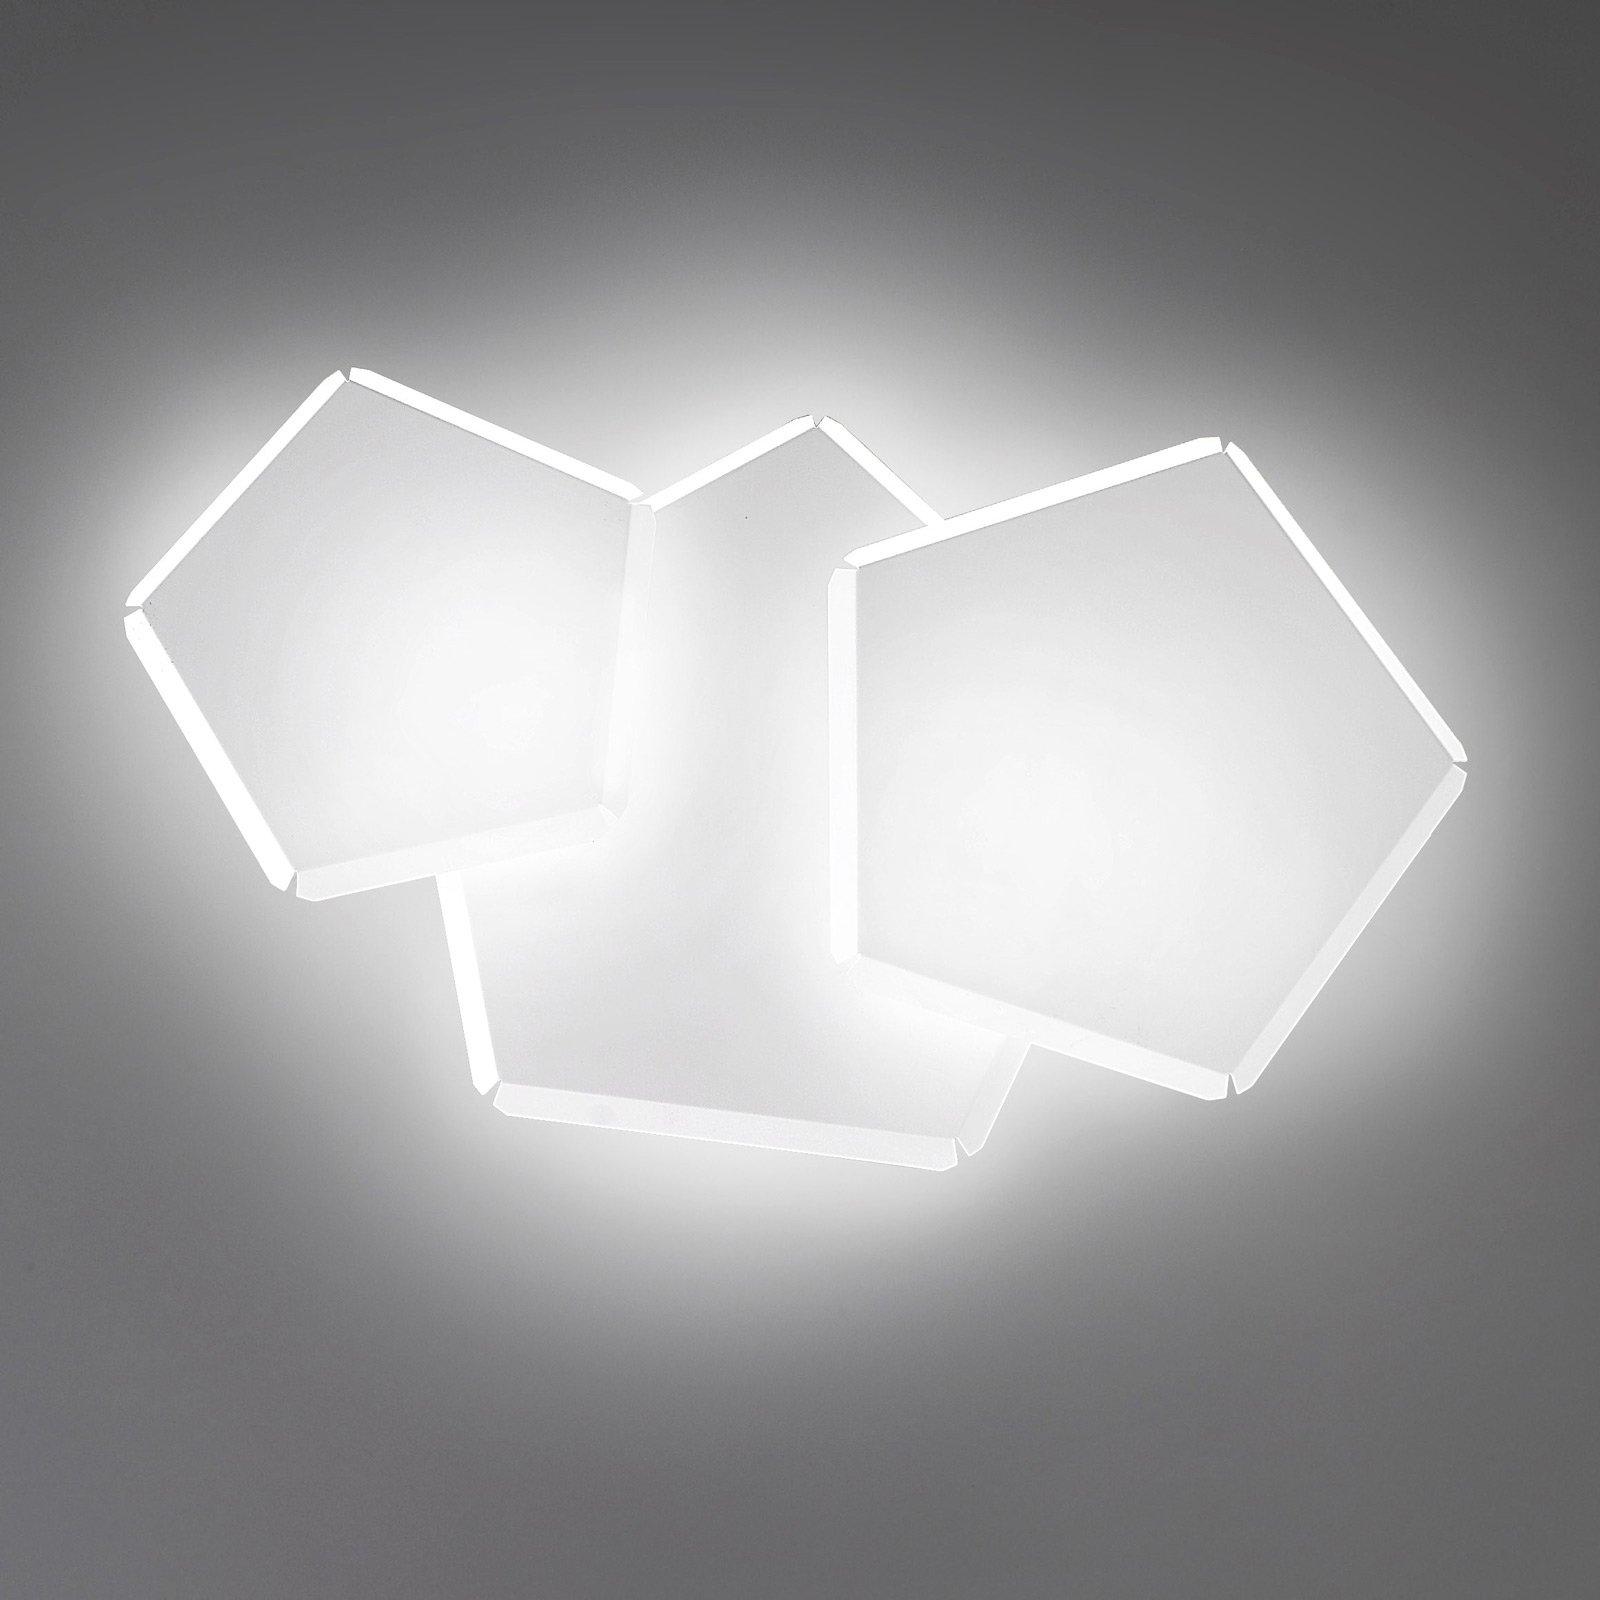 LED-vegglampe Pleiadi i hvit, 3 lyskilder